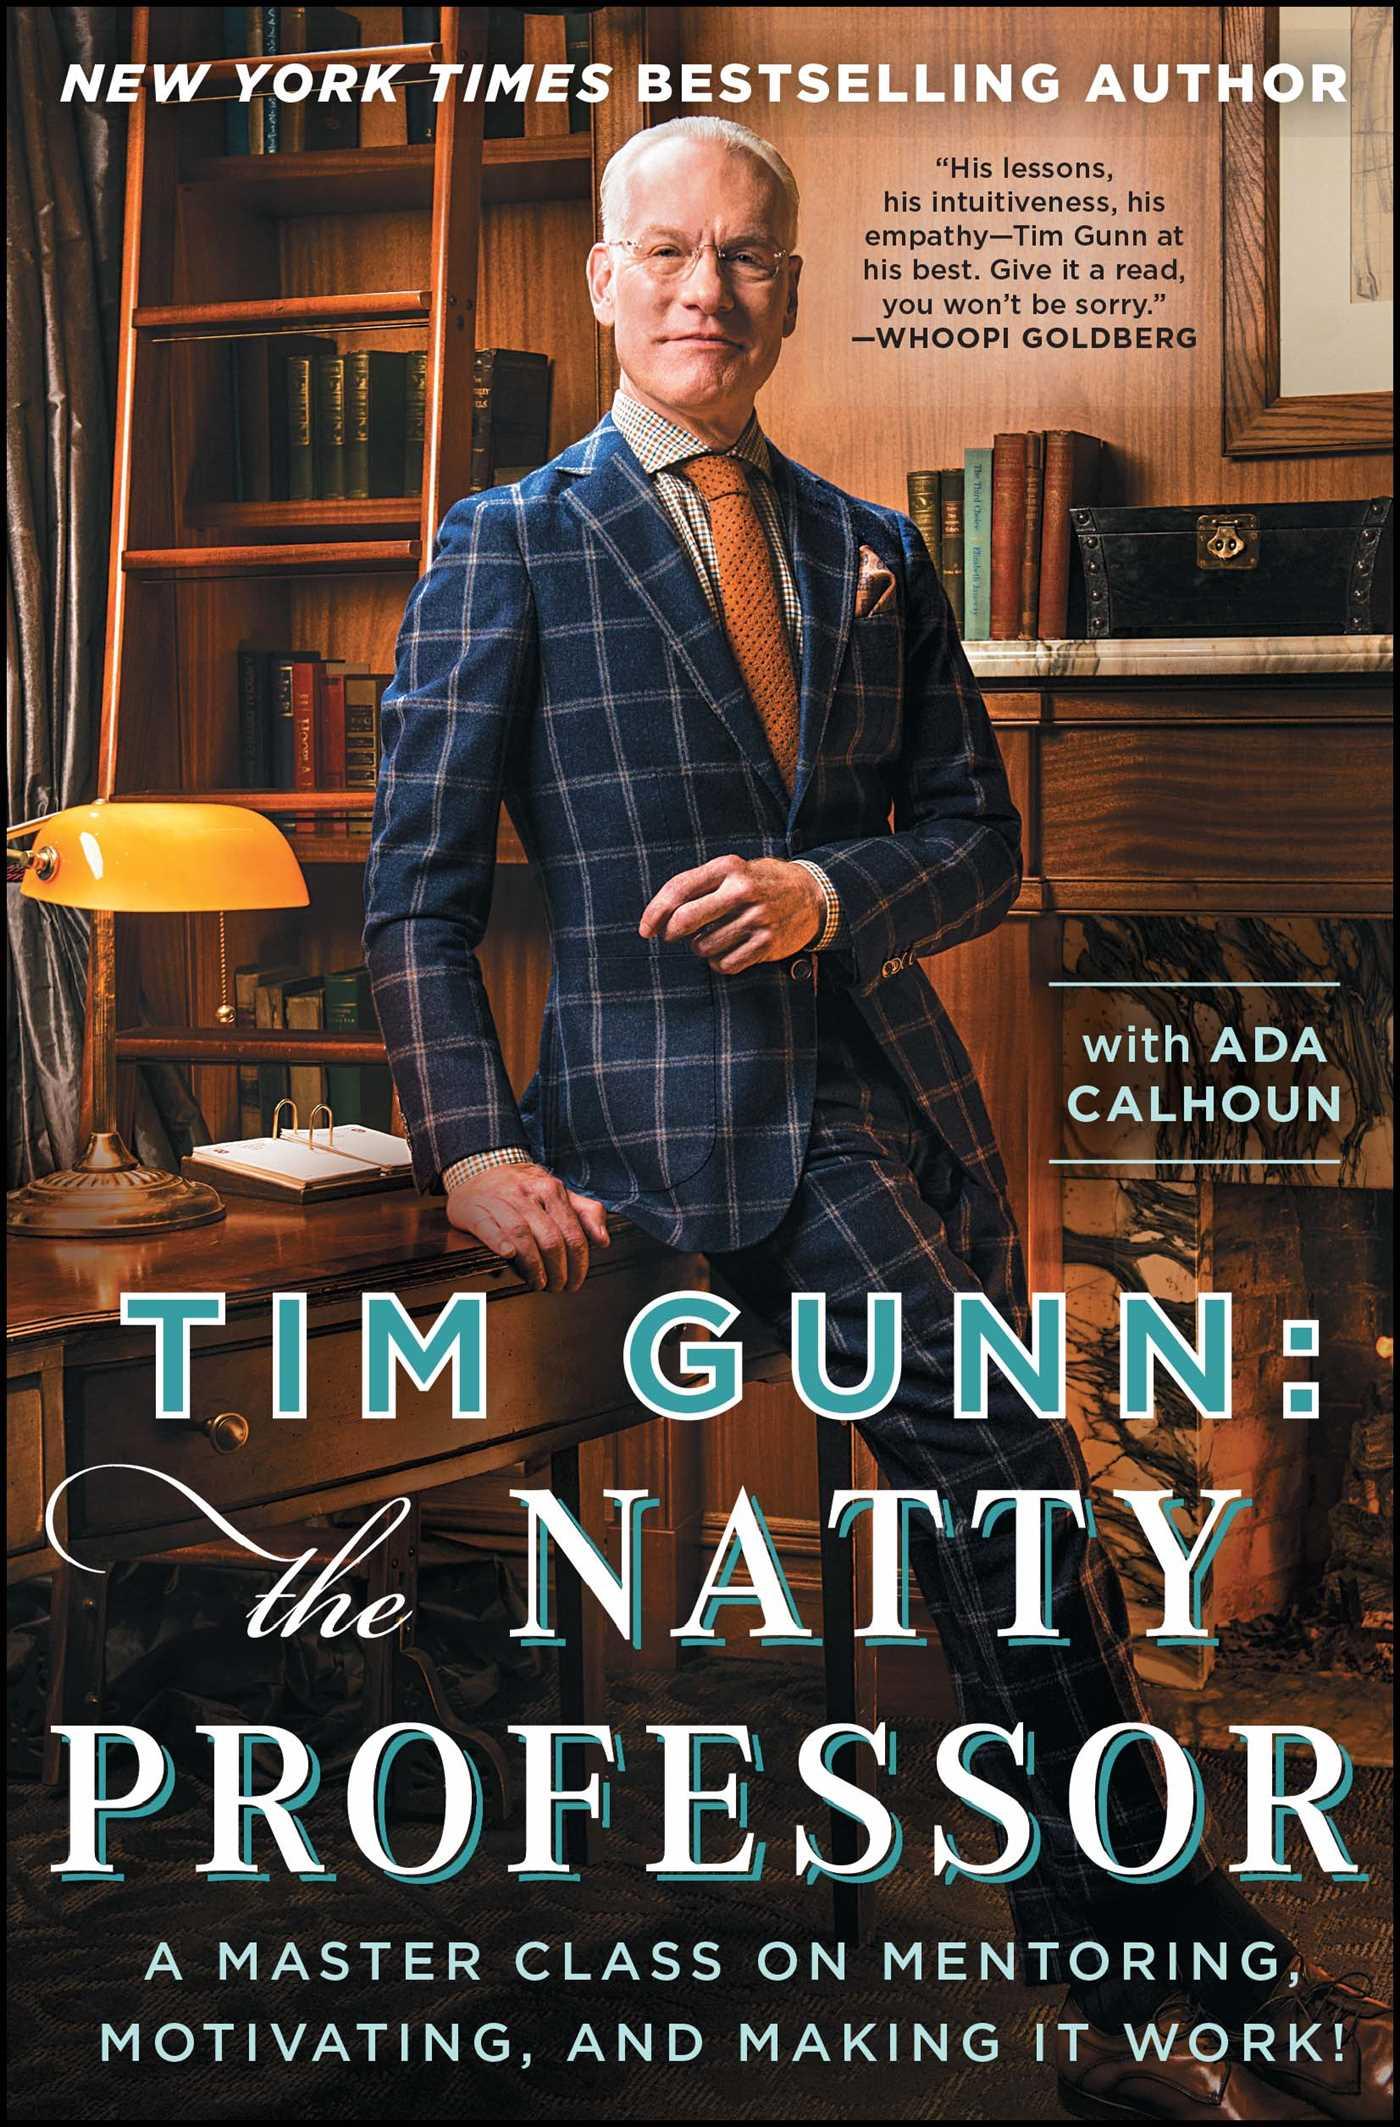 Tim gunn the natty professor 9781476780078 hr